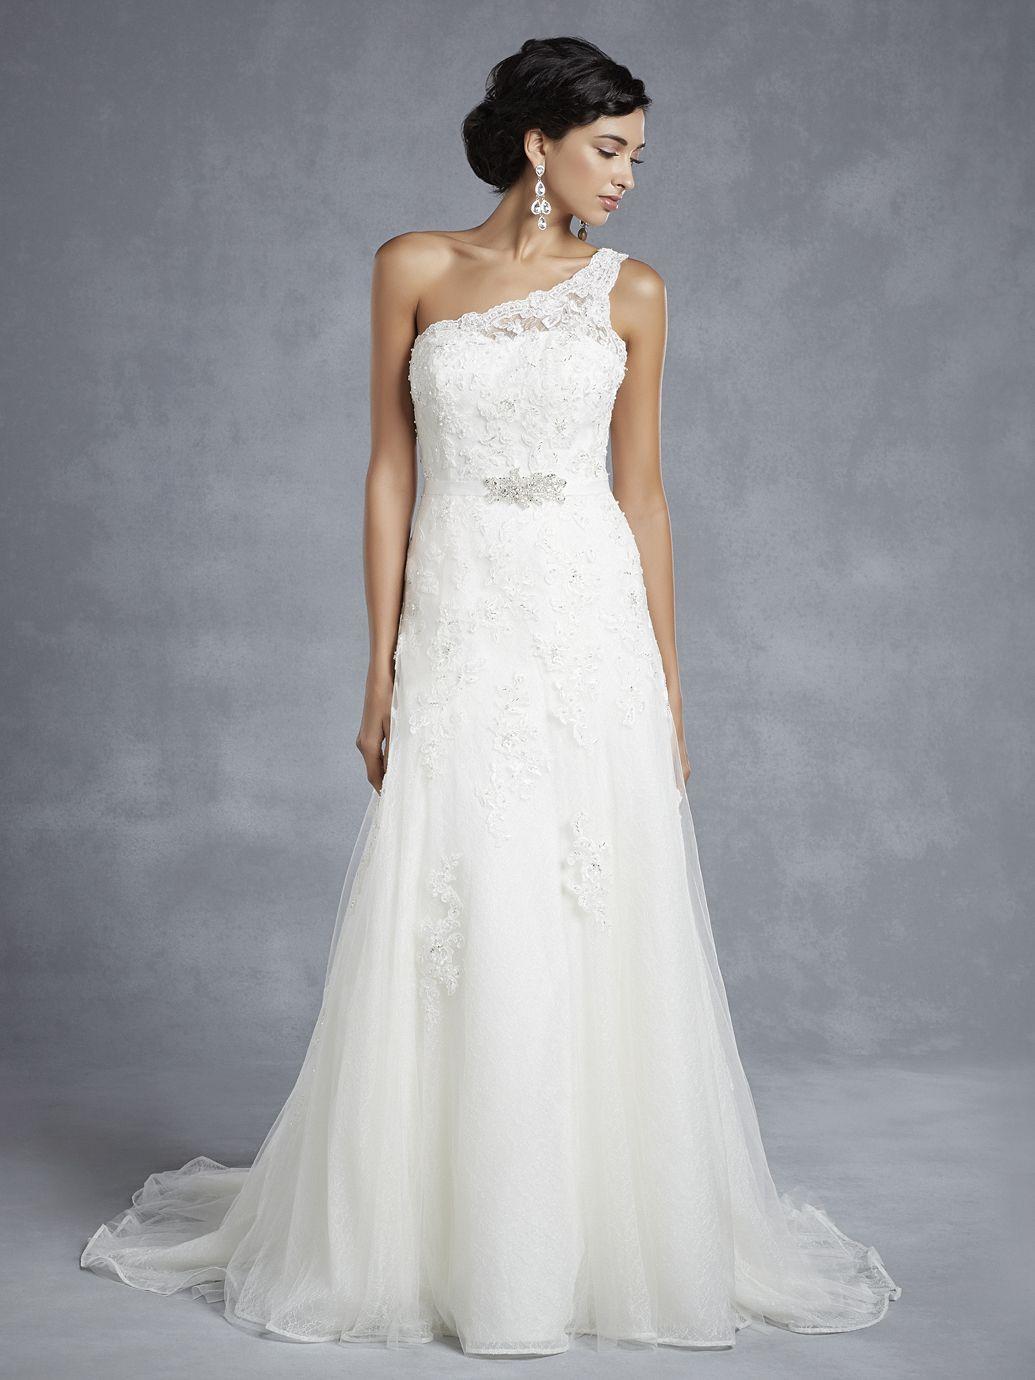 Elite wedding dresses  BT Front View  Future Mrs Jackson  Pinterest  Beautiful